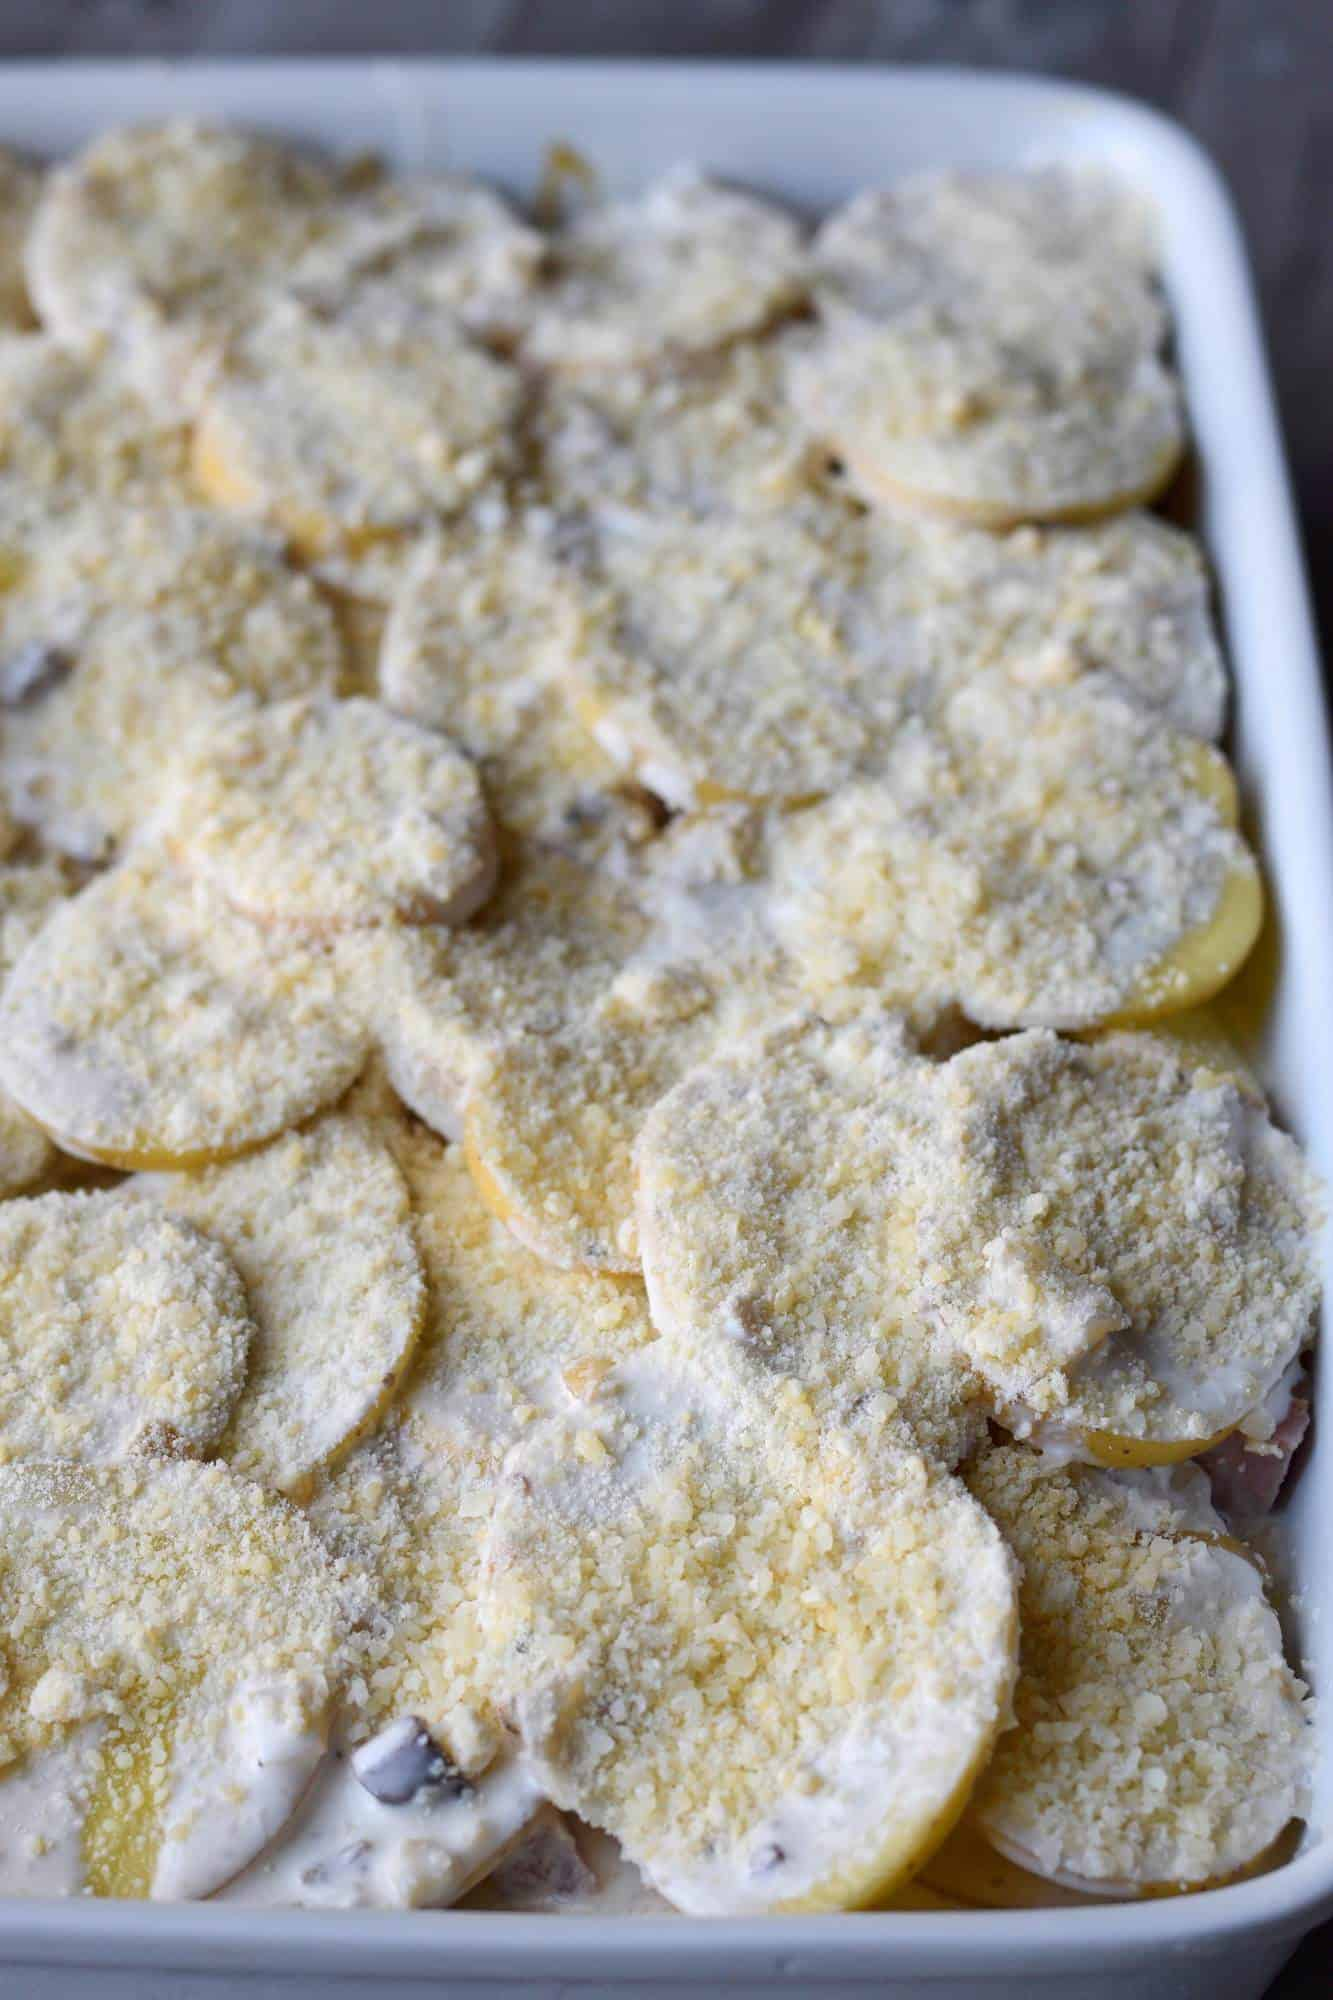 Parmesan Scalloped potatoes and ham before baking